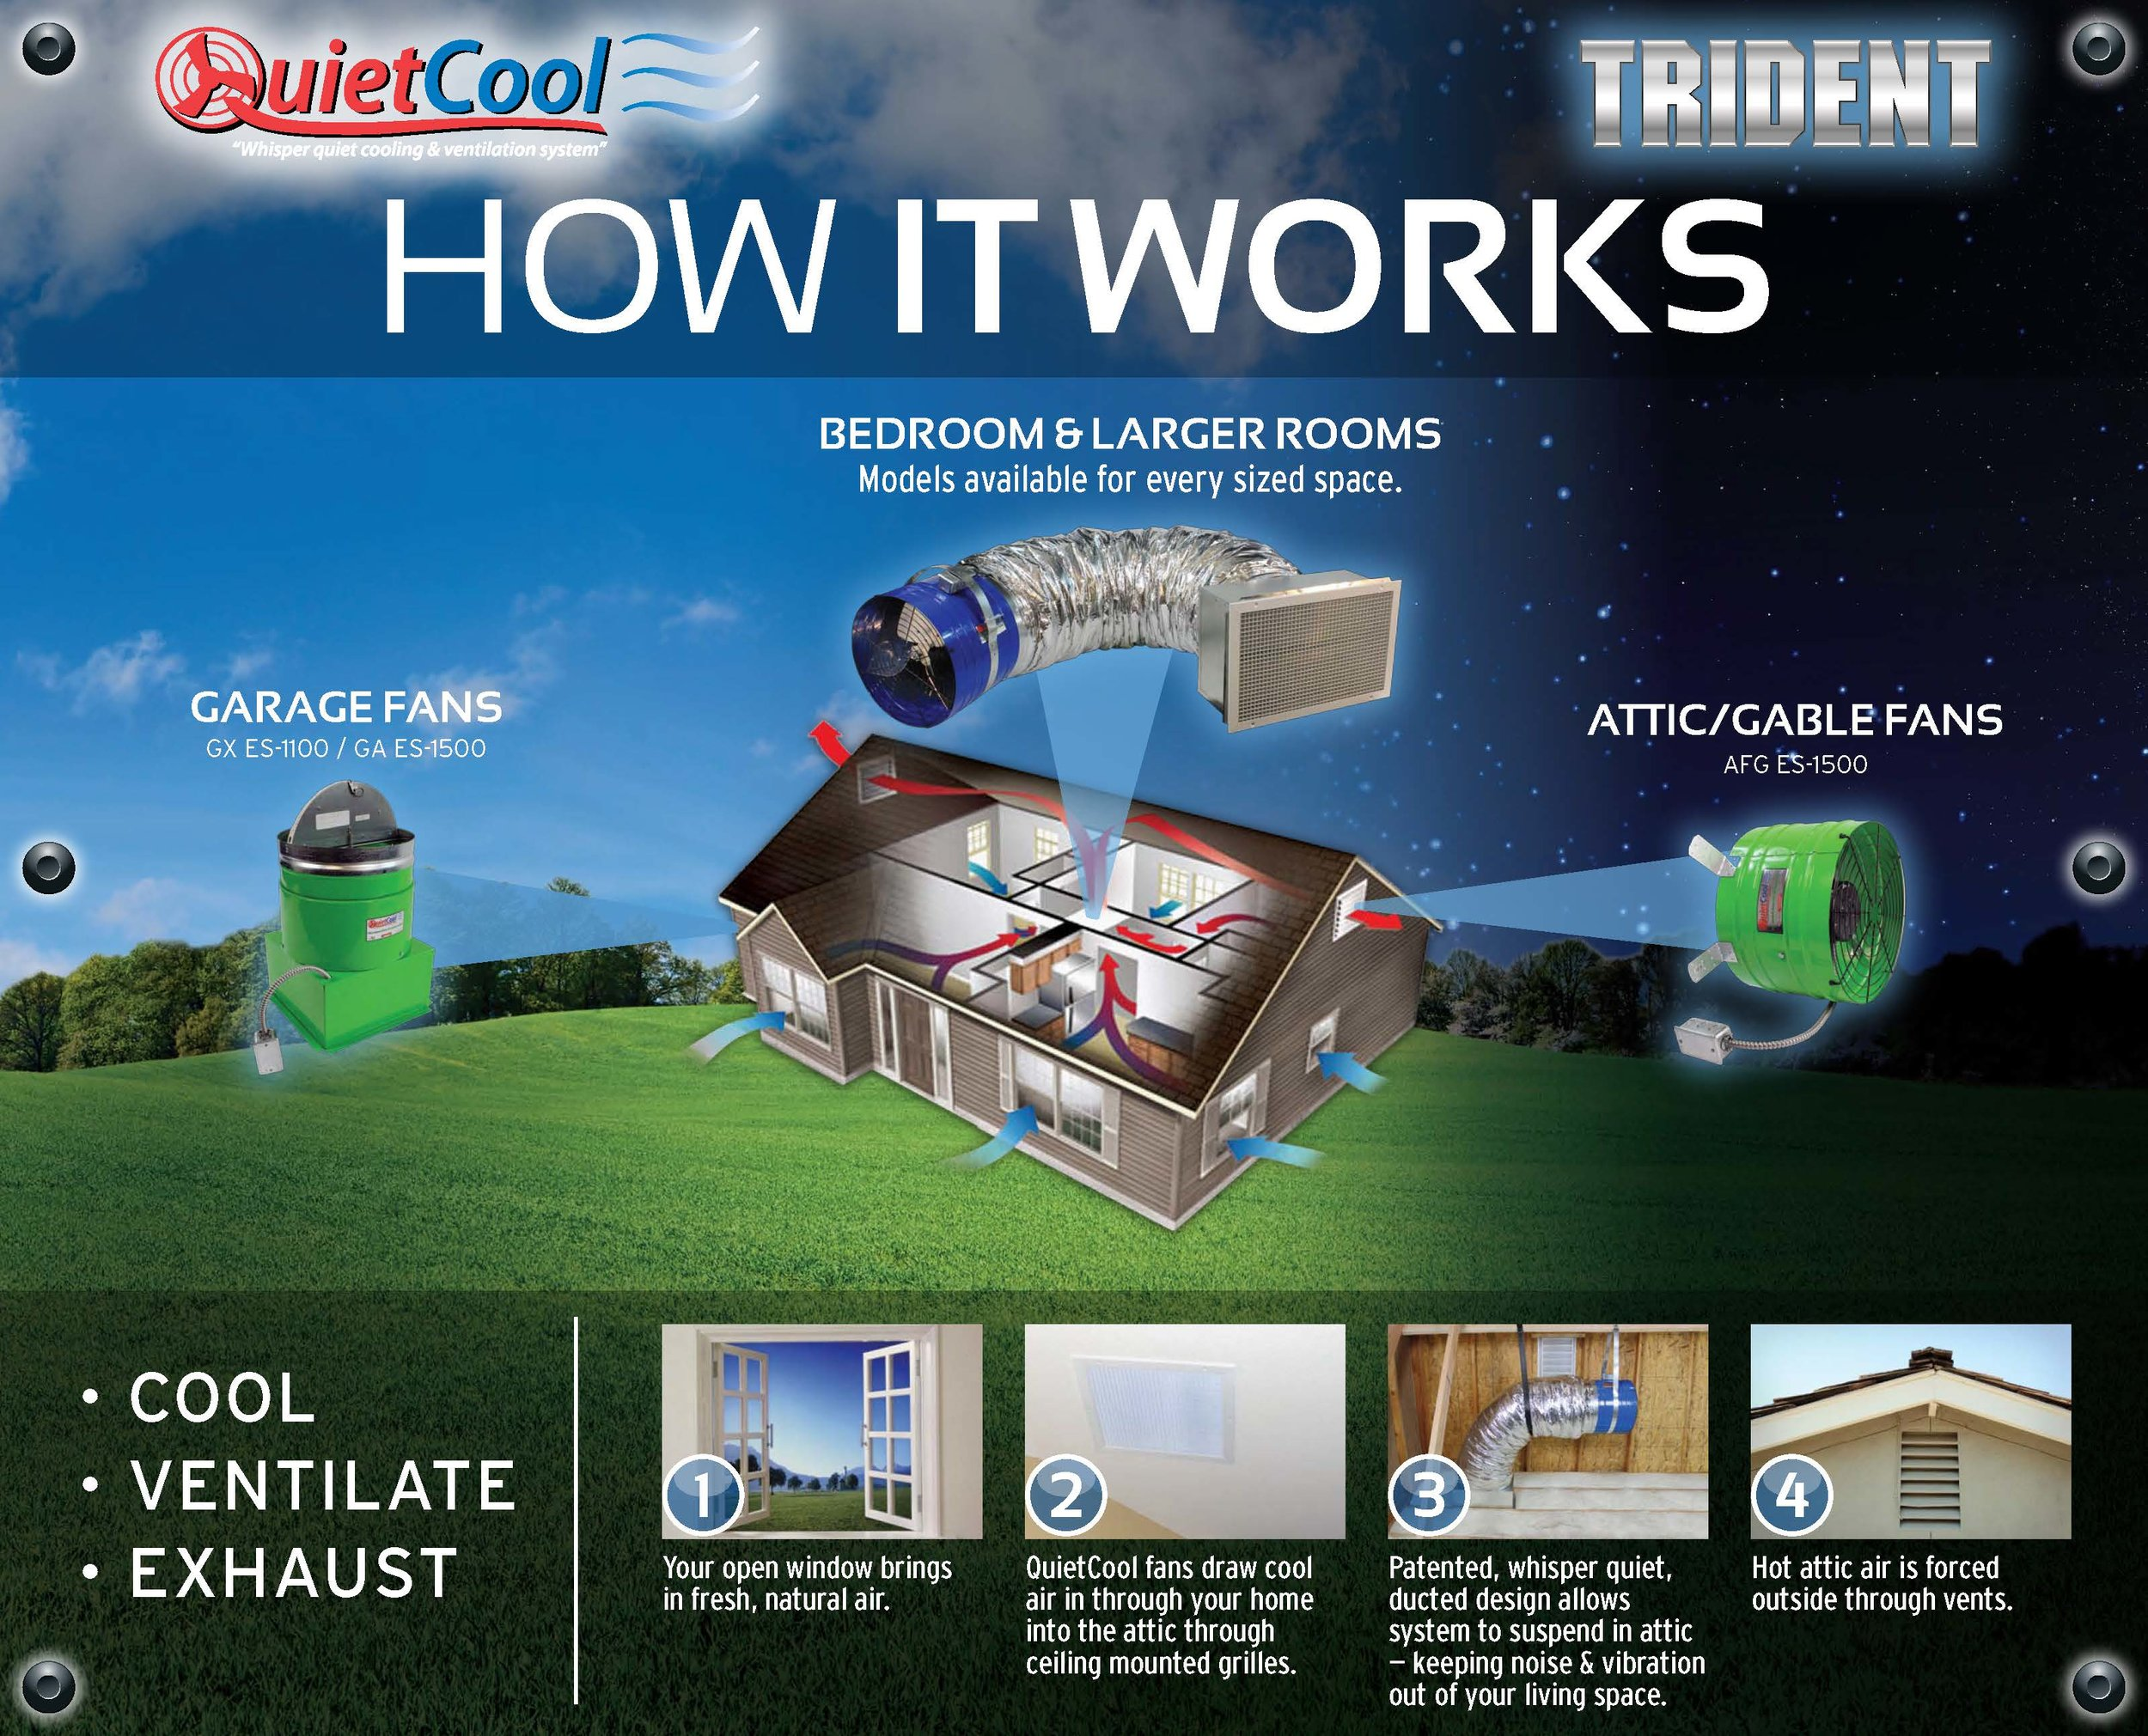 Whole house fan QuietCool